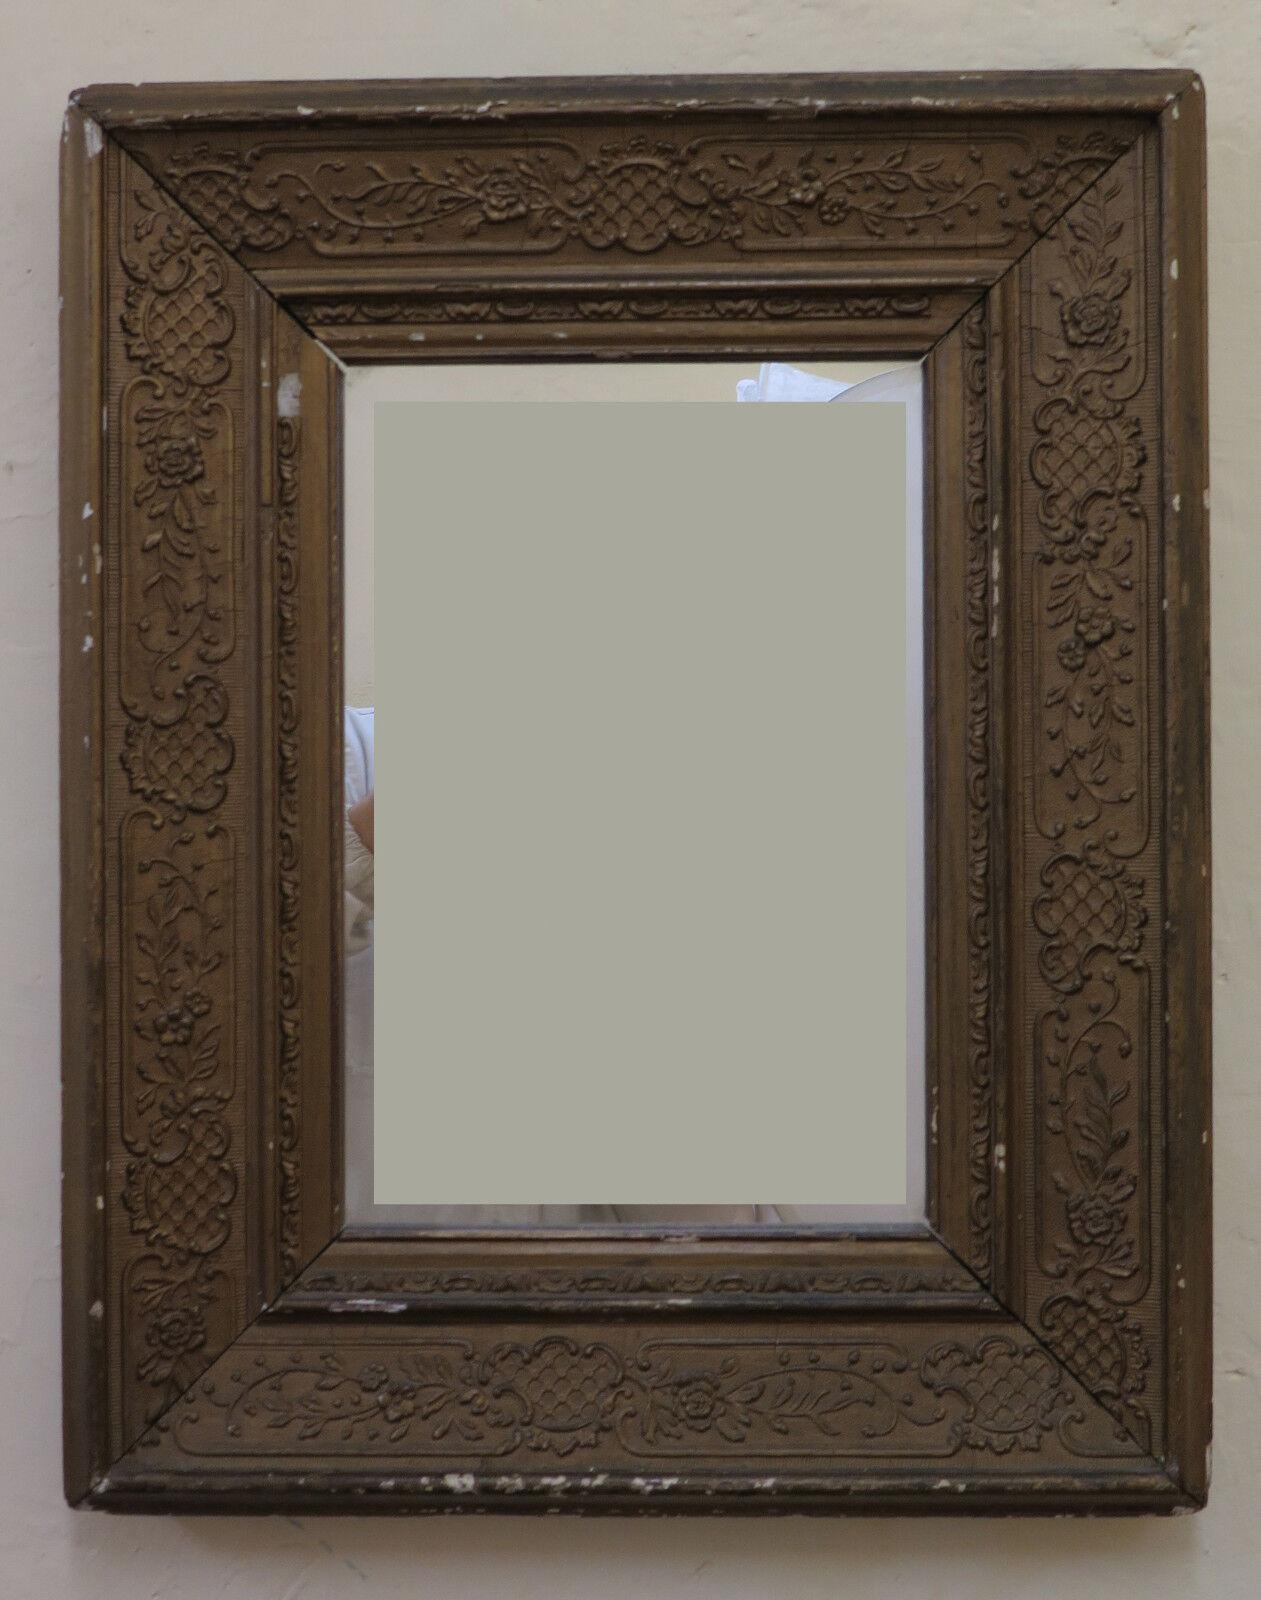 Frame Antique Liberty Art Nouveau Floral Eclectic for Paintings Mirror SU2